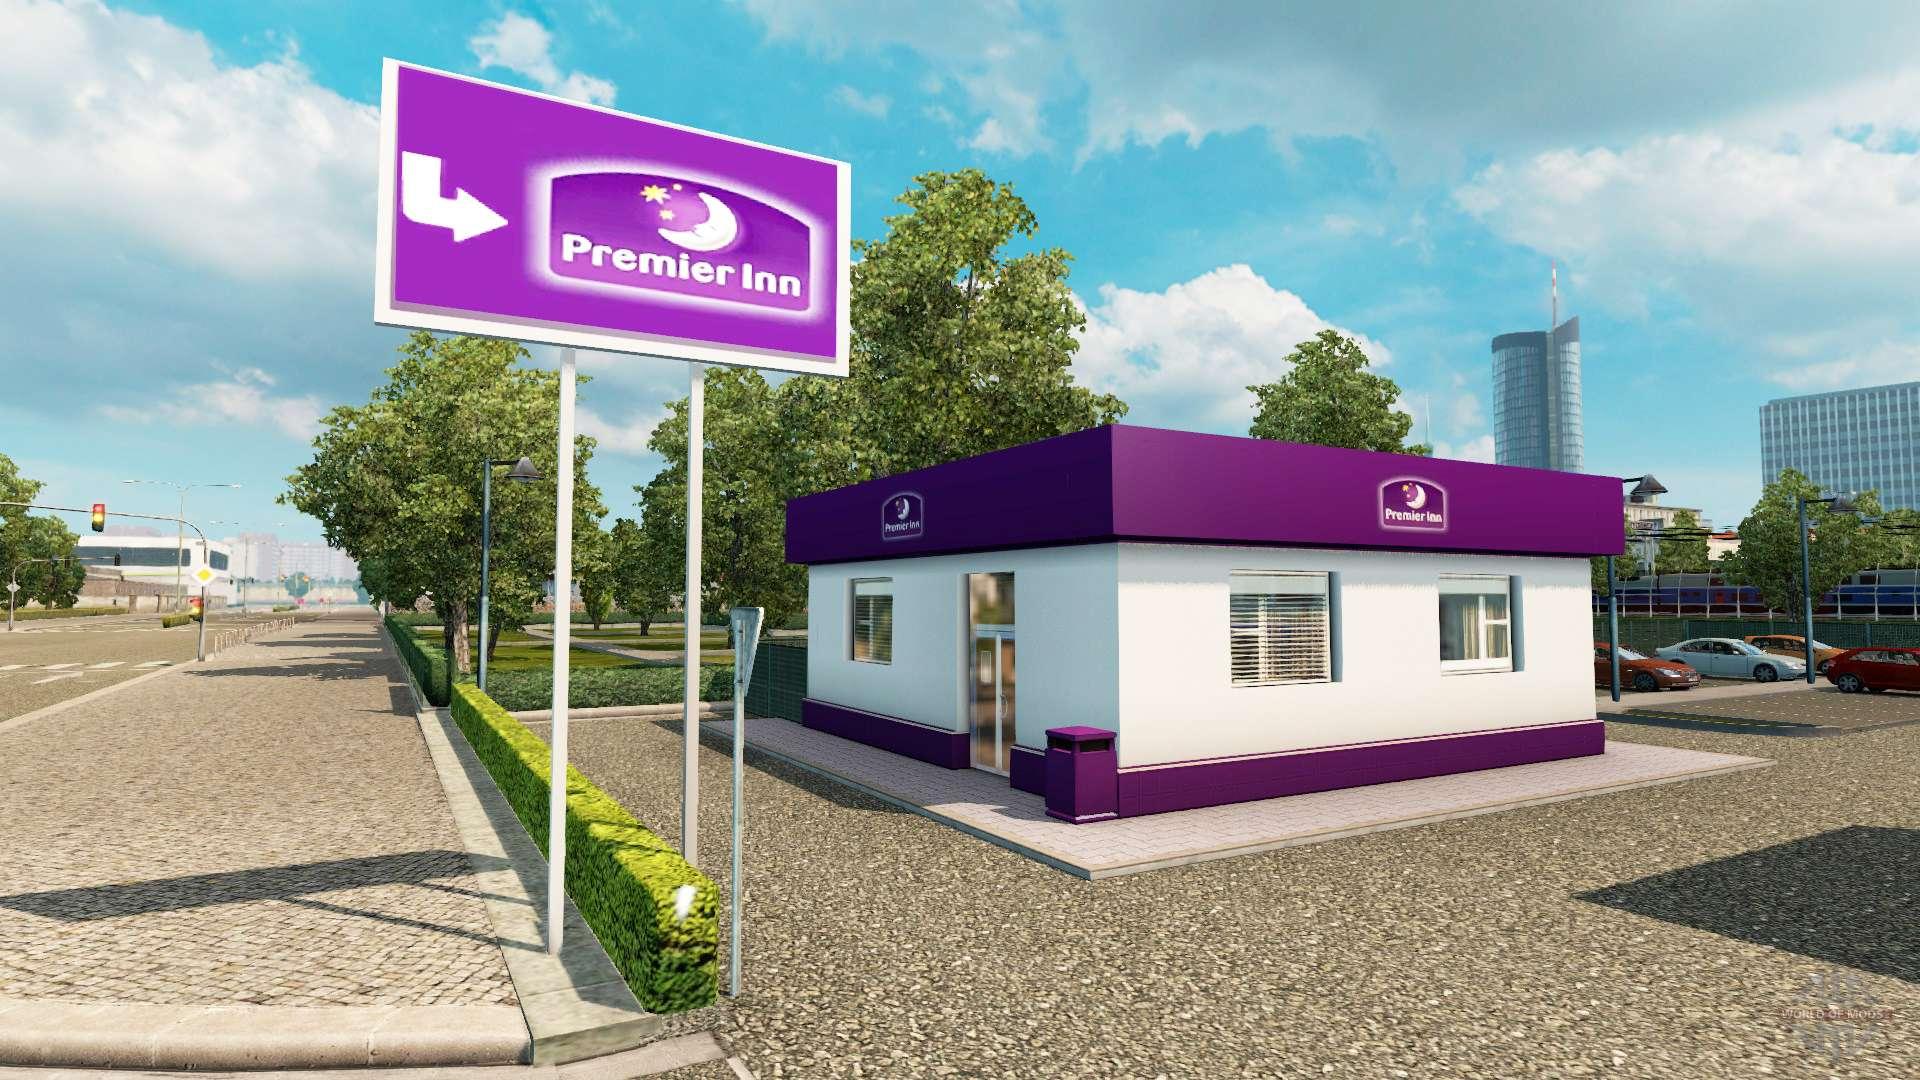 La cha ne d 39 h tel travelodge et premier inn pour euro for Chaine hotel